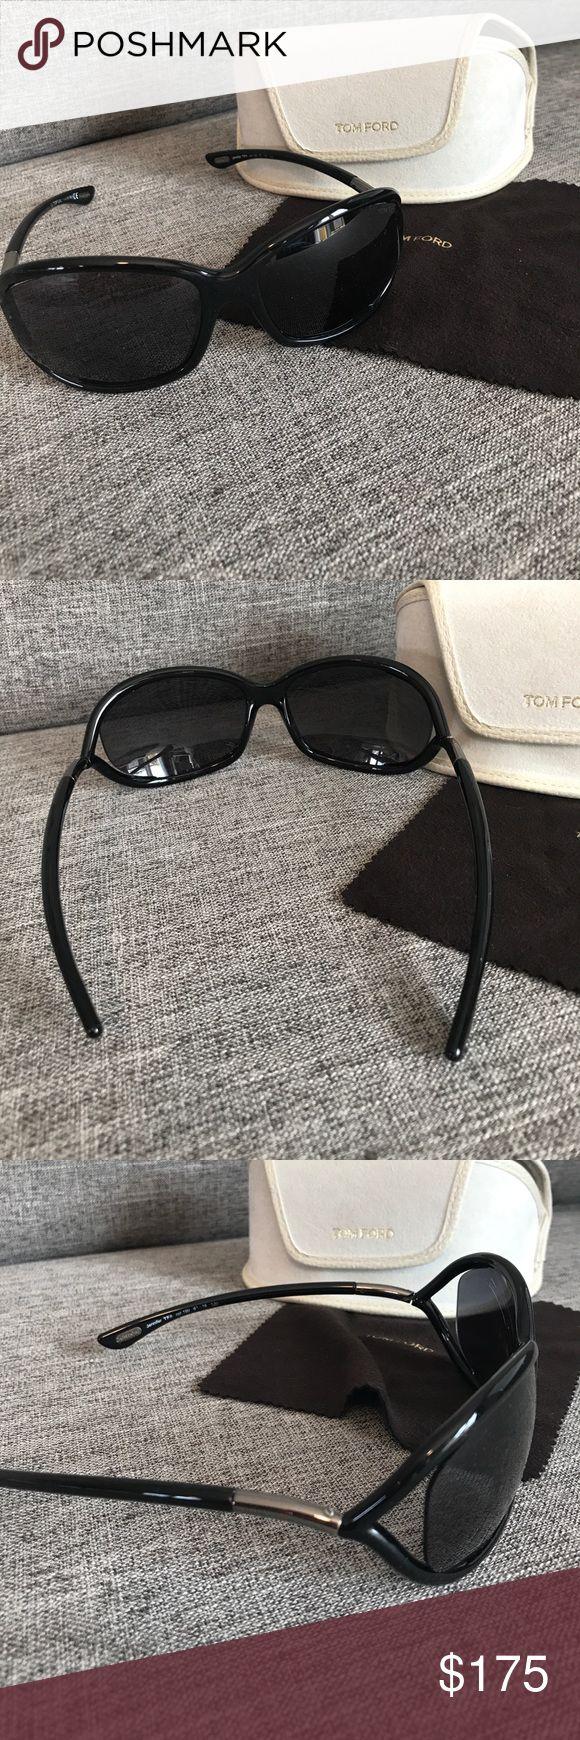 Tom Ford - Jennifer Sunglasses. Tom Ford - Jennifer Sunglasses. Signature Jennifer sunglasses includes Tom Ford case and Tom Ford sunglasses cleaner cloth. Black sunglasses. Tom Ford Accessories Sunglasses